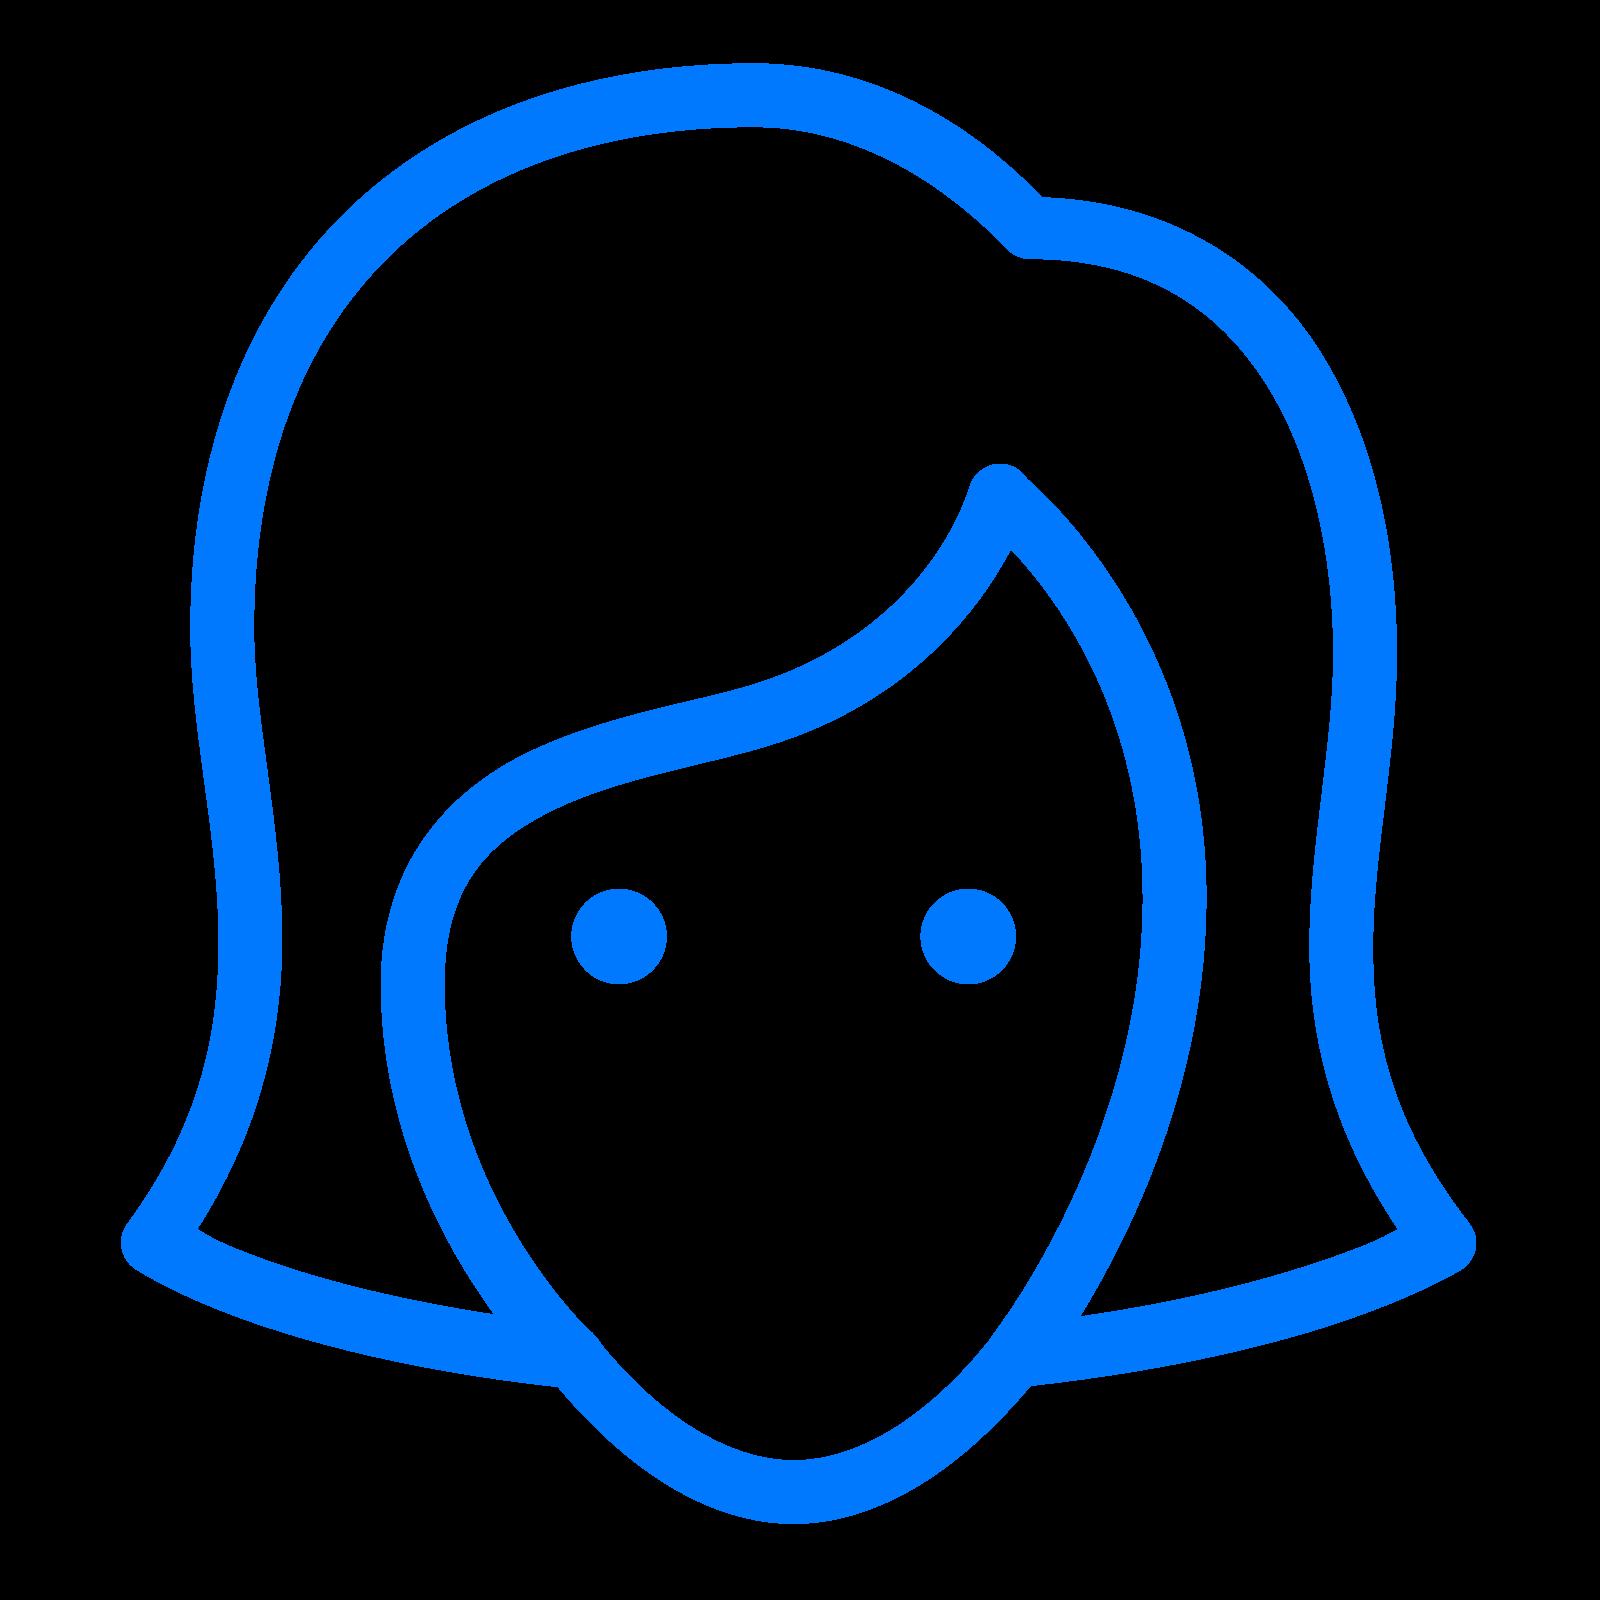 Stress clipart computer stress. Icons user headache avatar